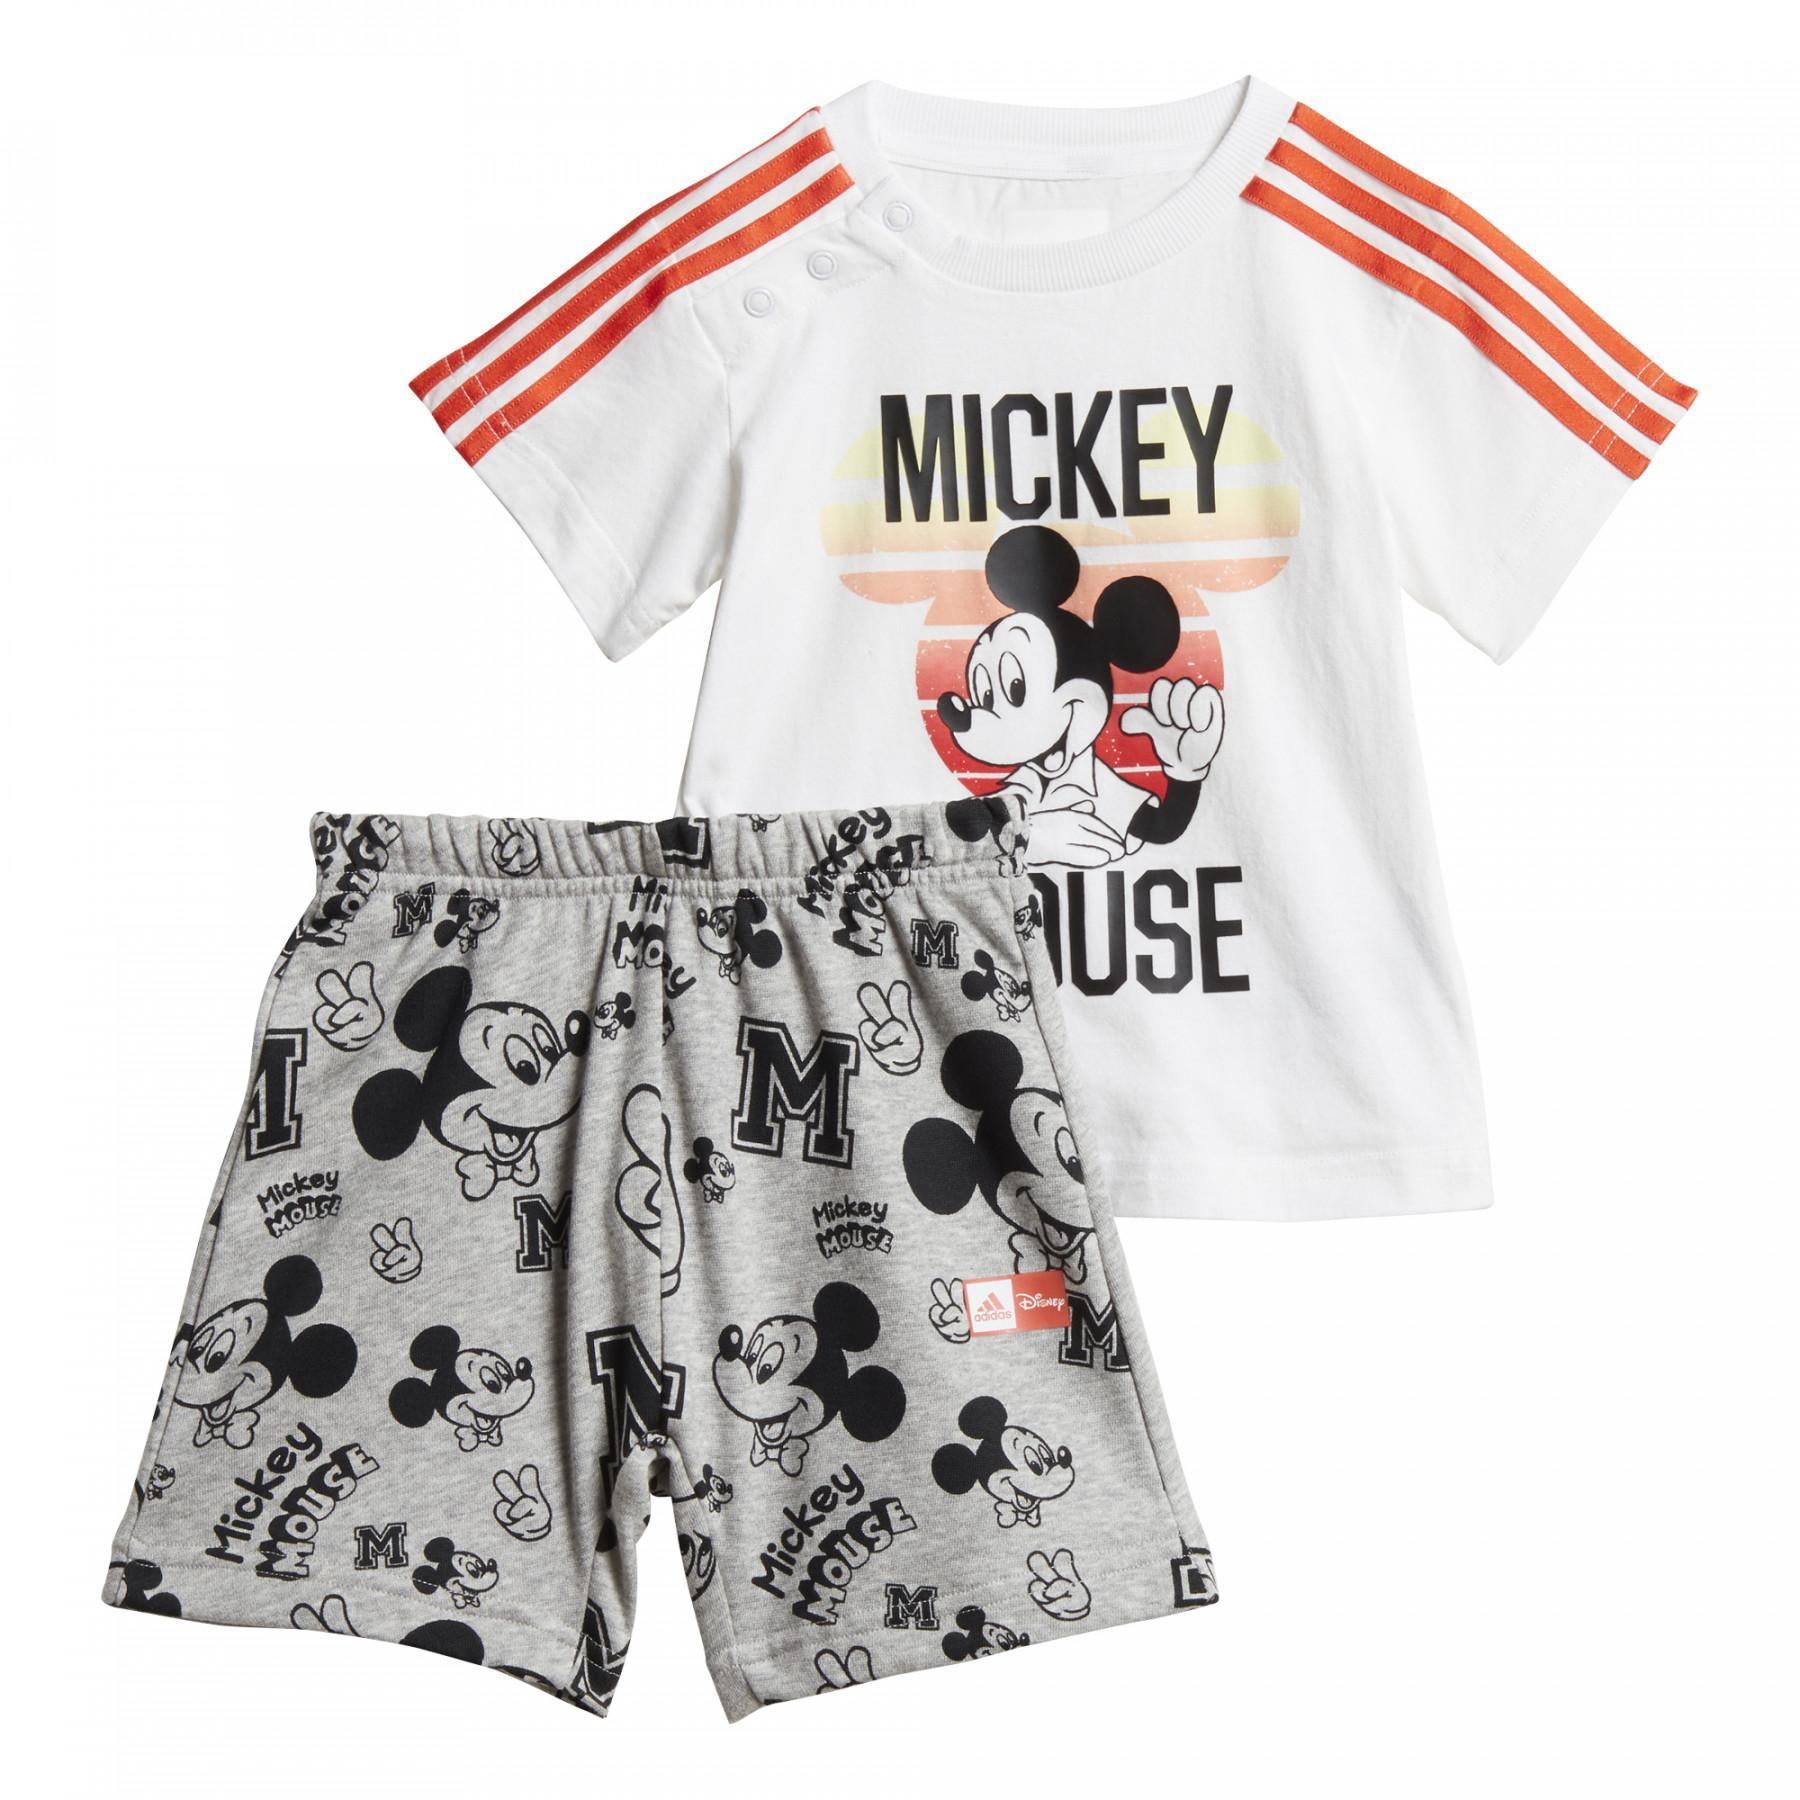 adidas Disney Mickey Mouse Summer Baby-kit